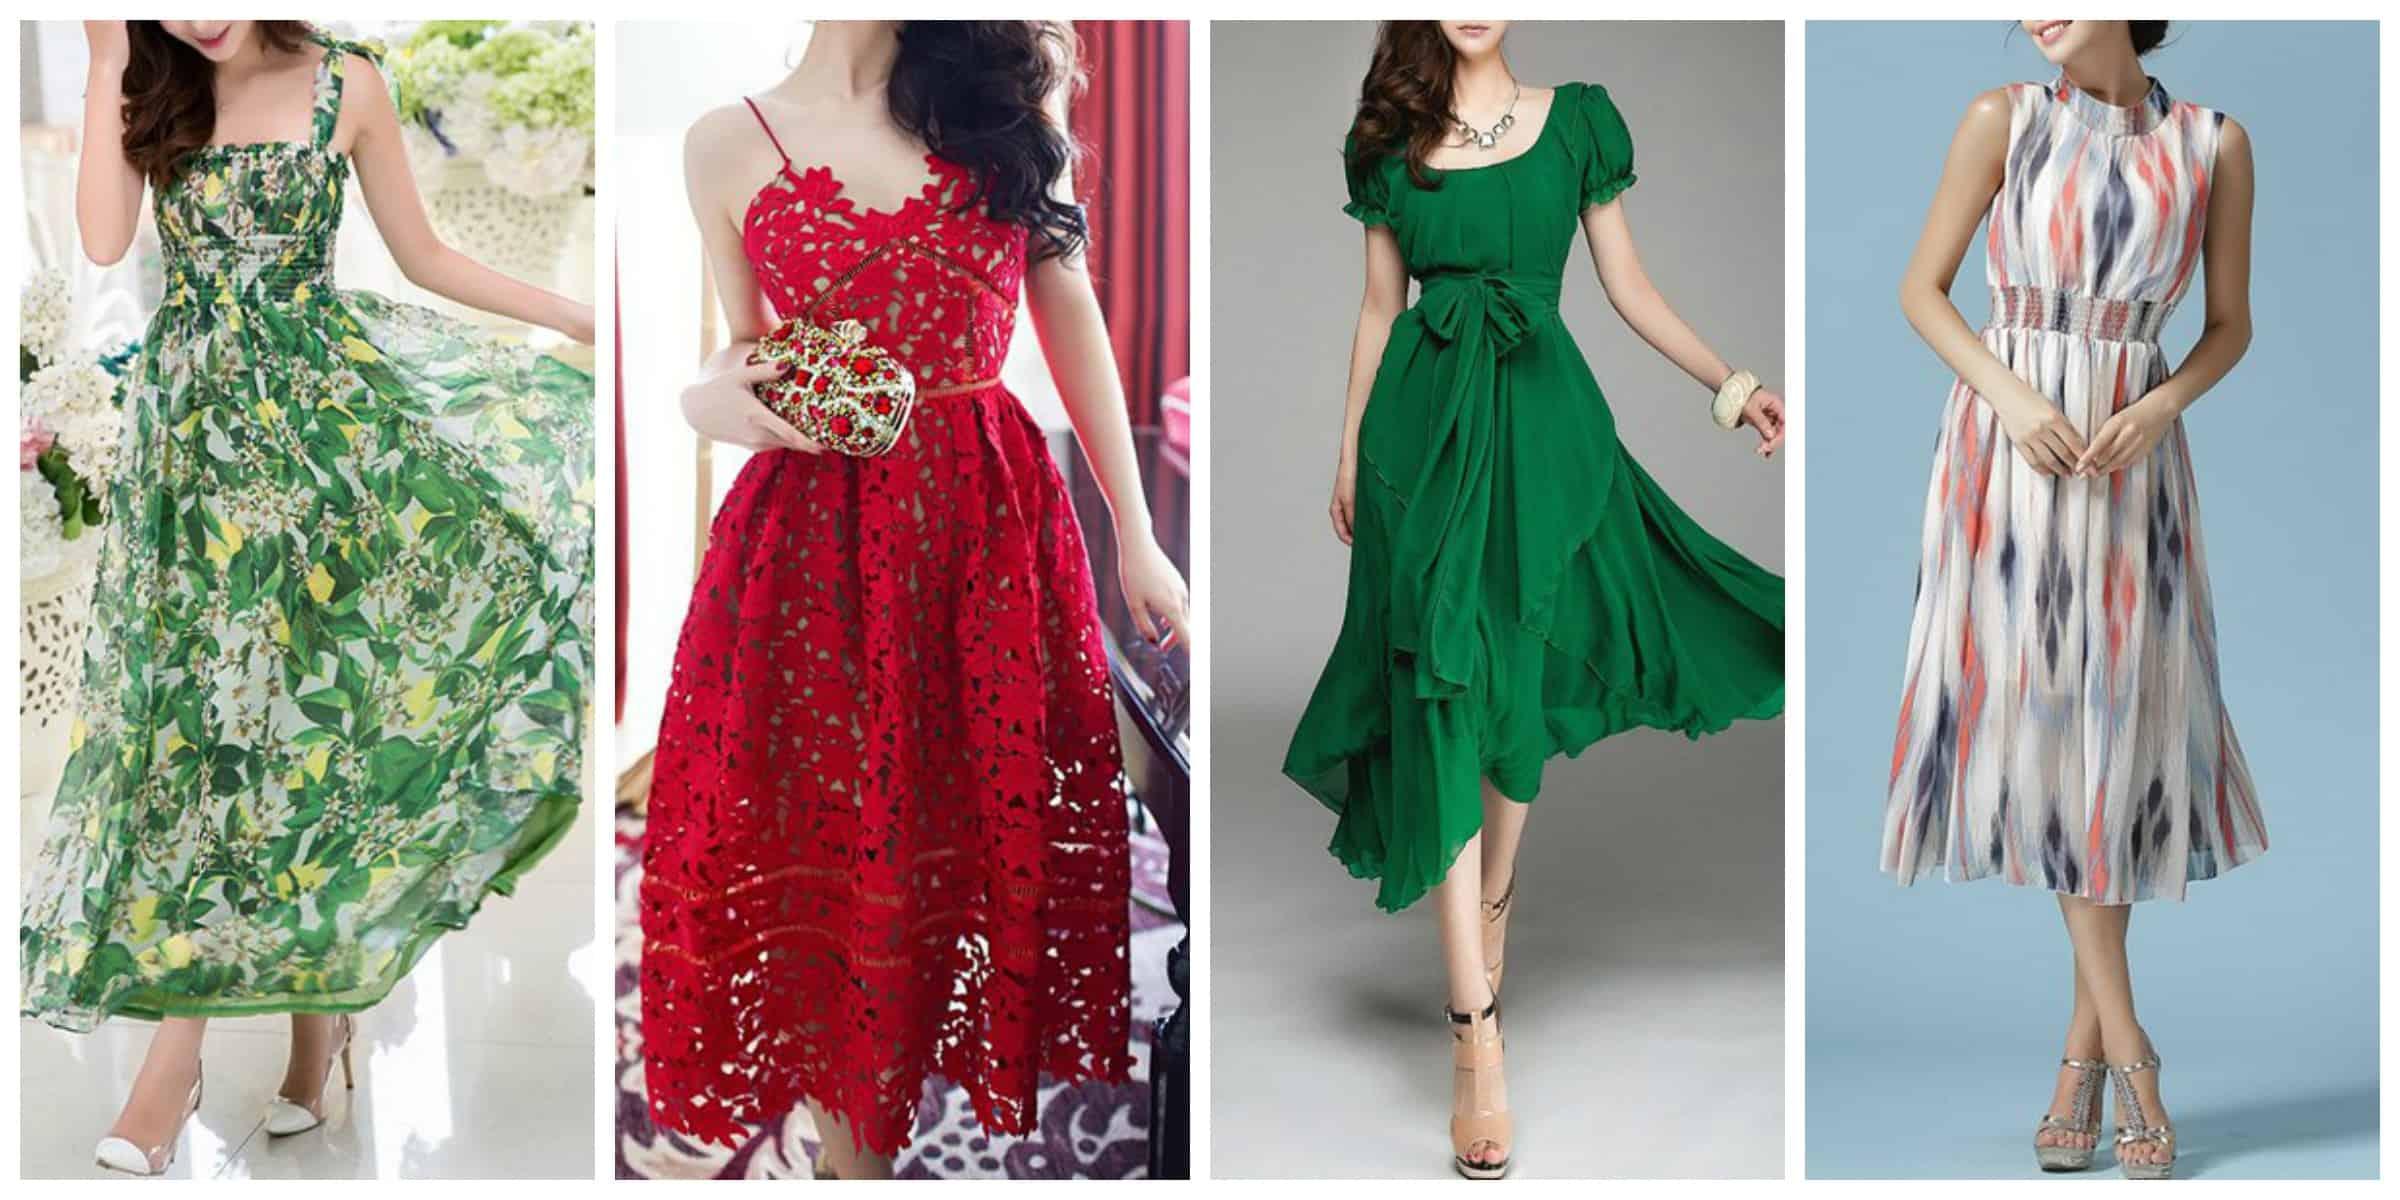 retro-dresses-sammy-dress